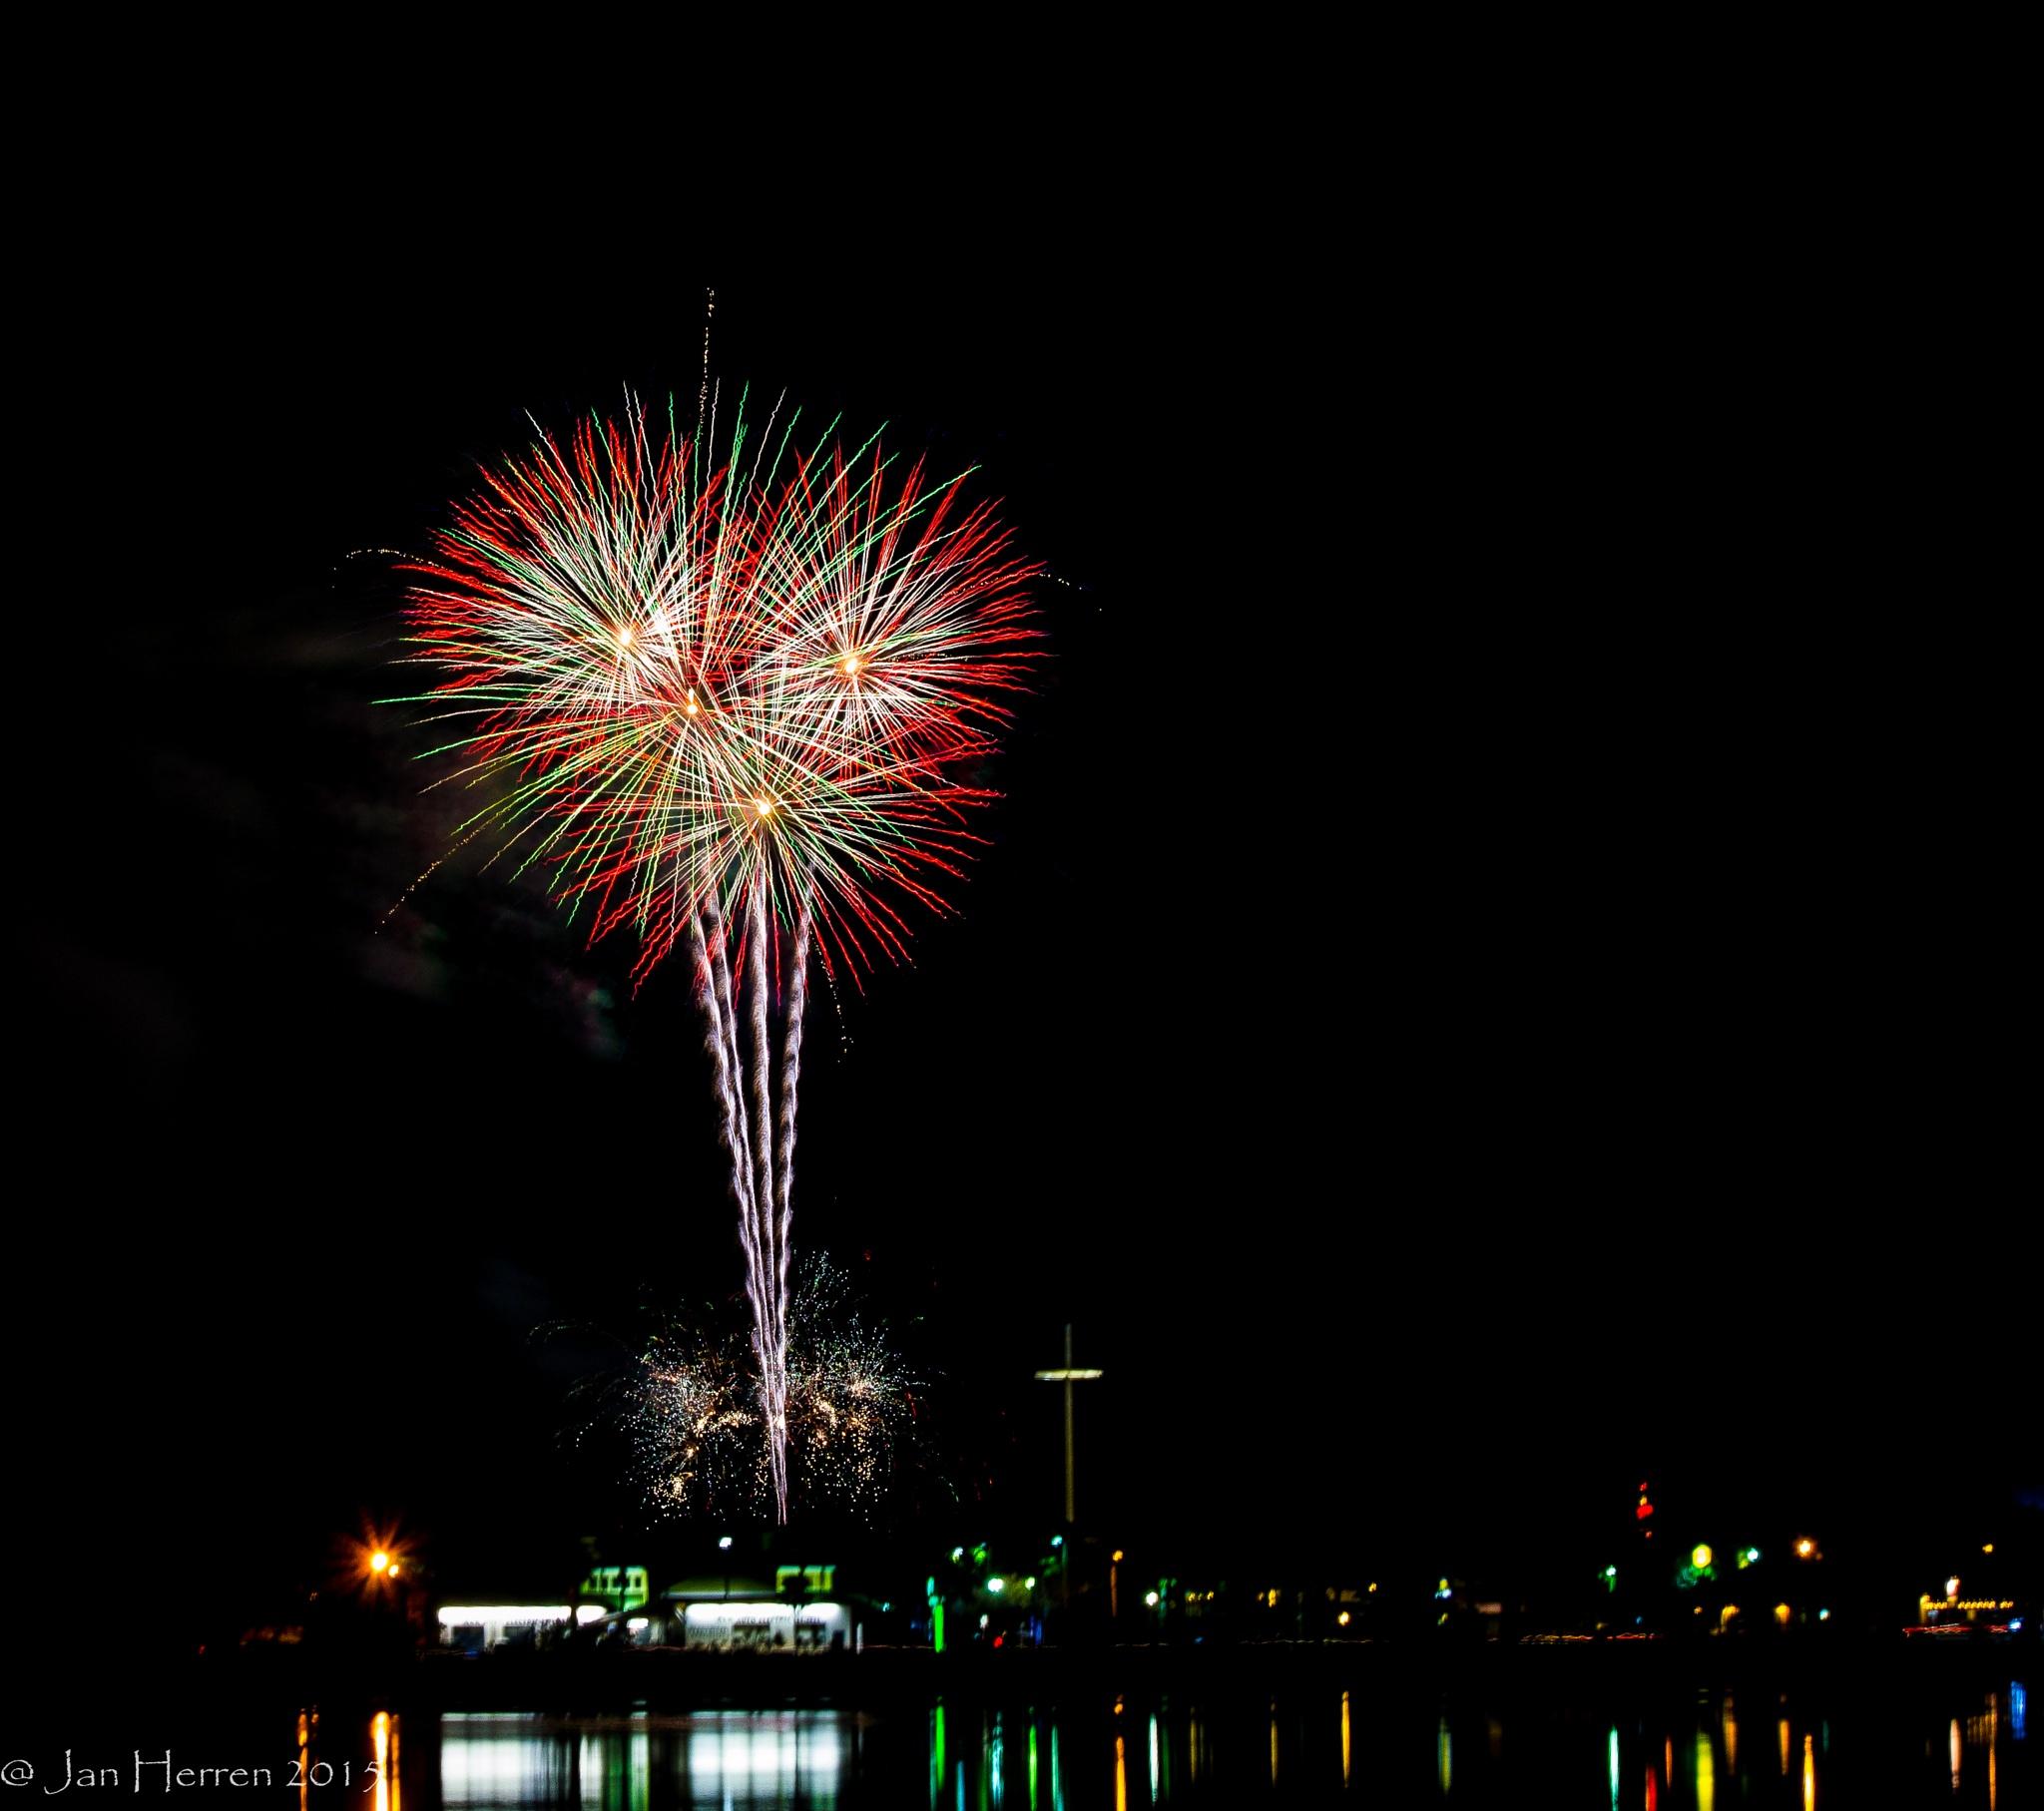 Fireworks 1 by Jan Herren